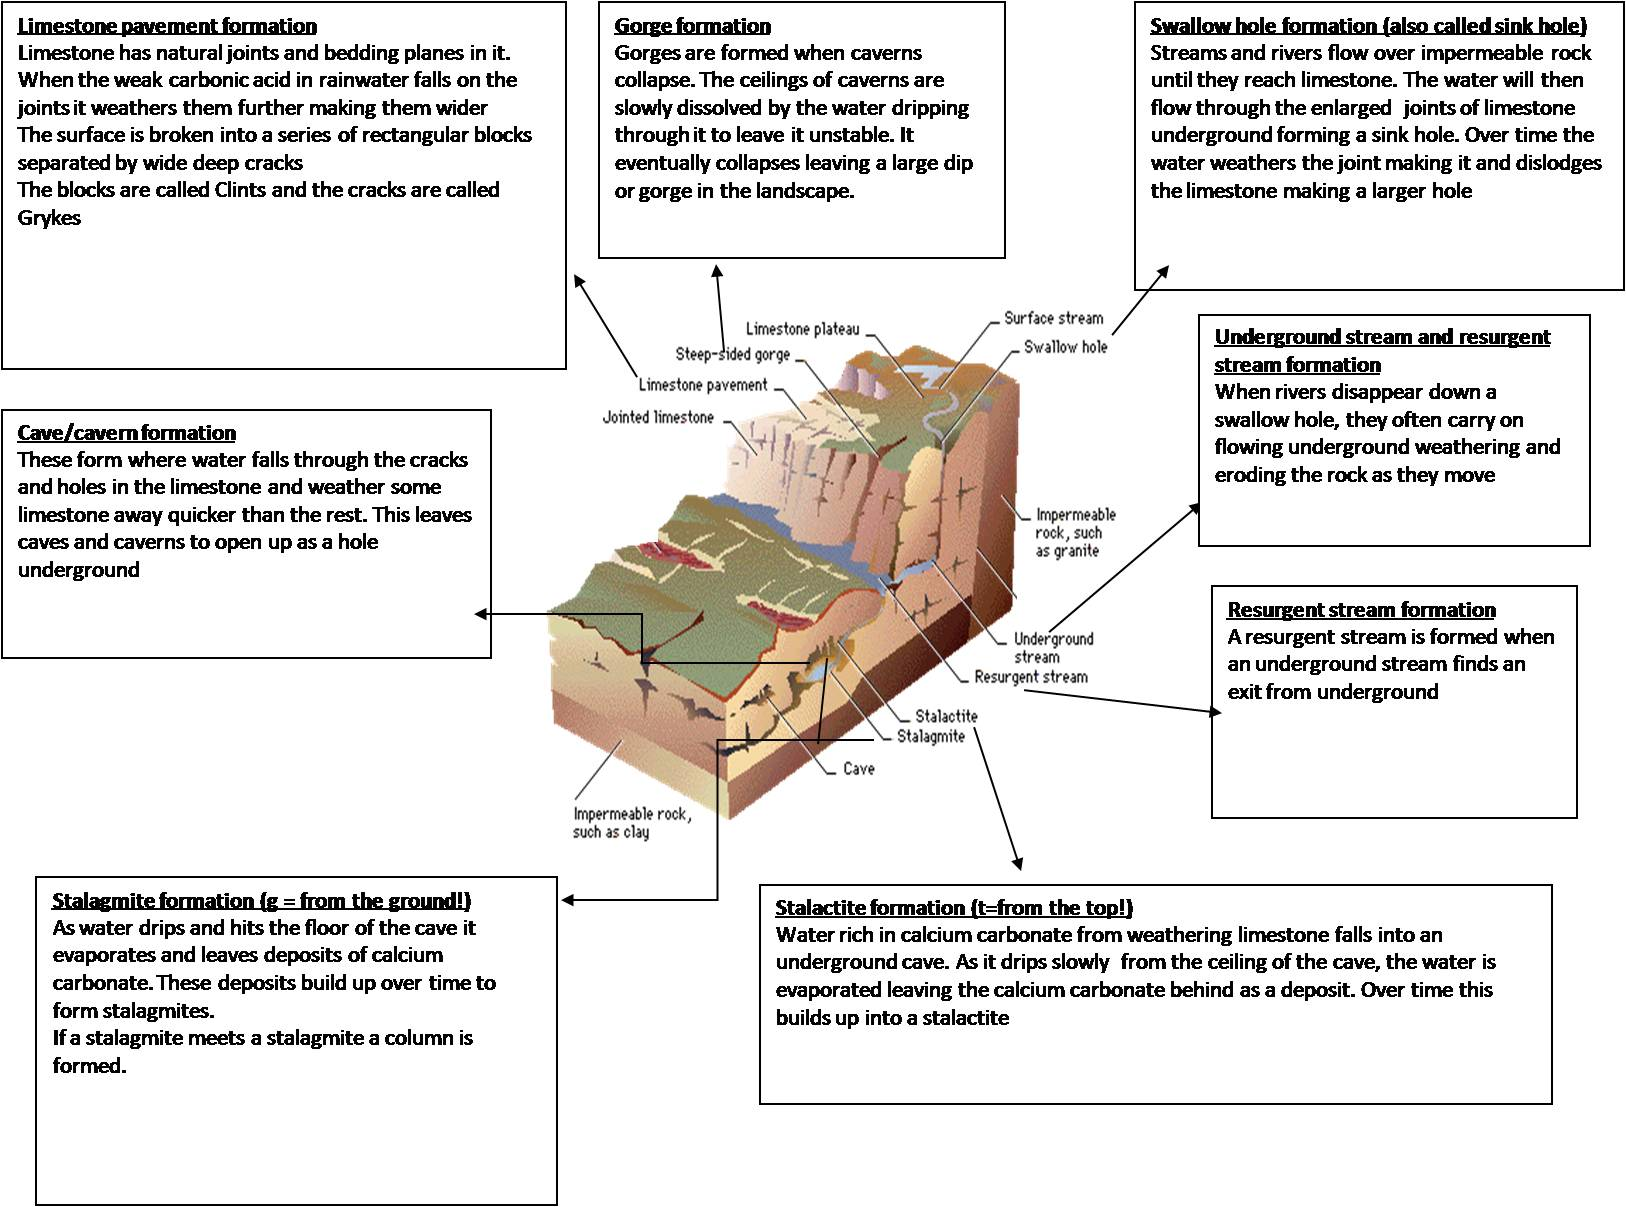 mechanical weathering diagram alpine cda 9827 wiring as rocks and mrs conrad 39s kis i alevel